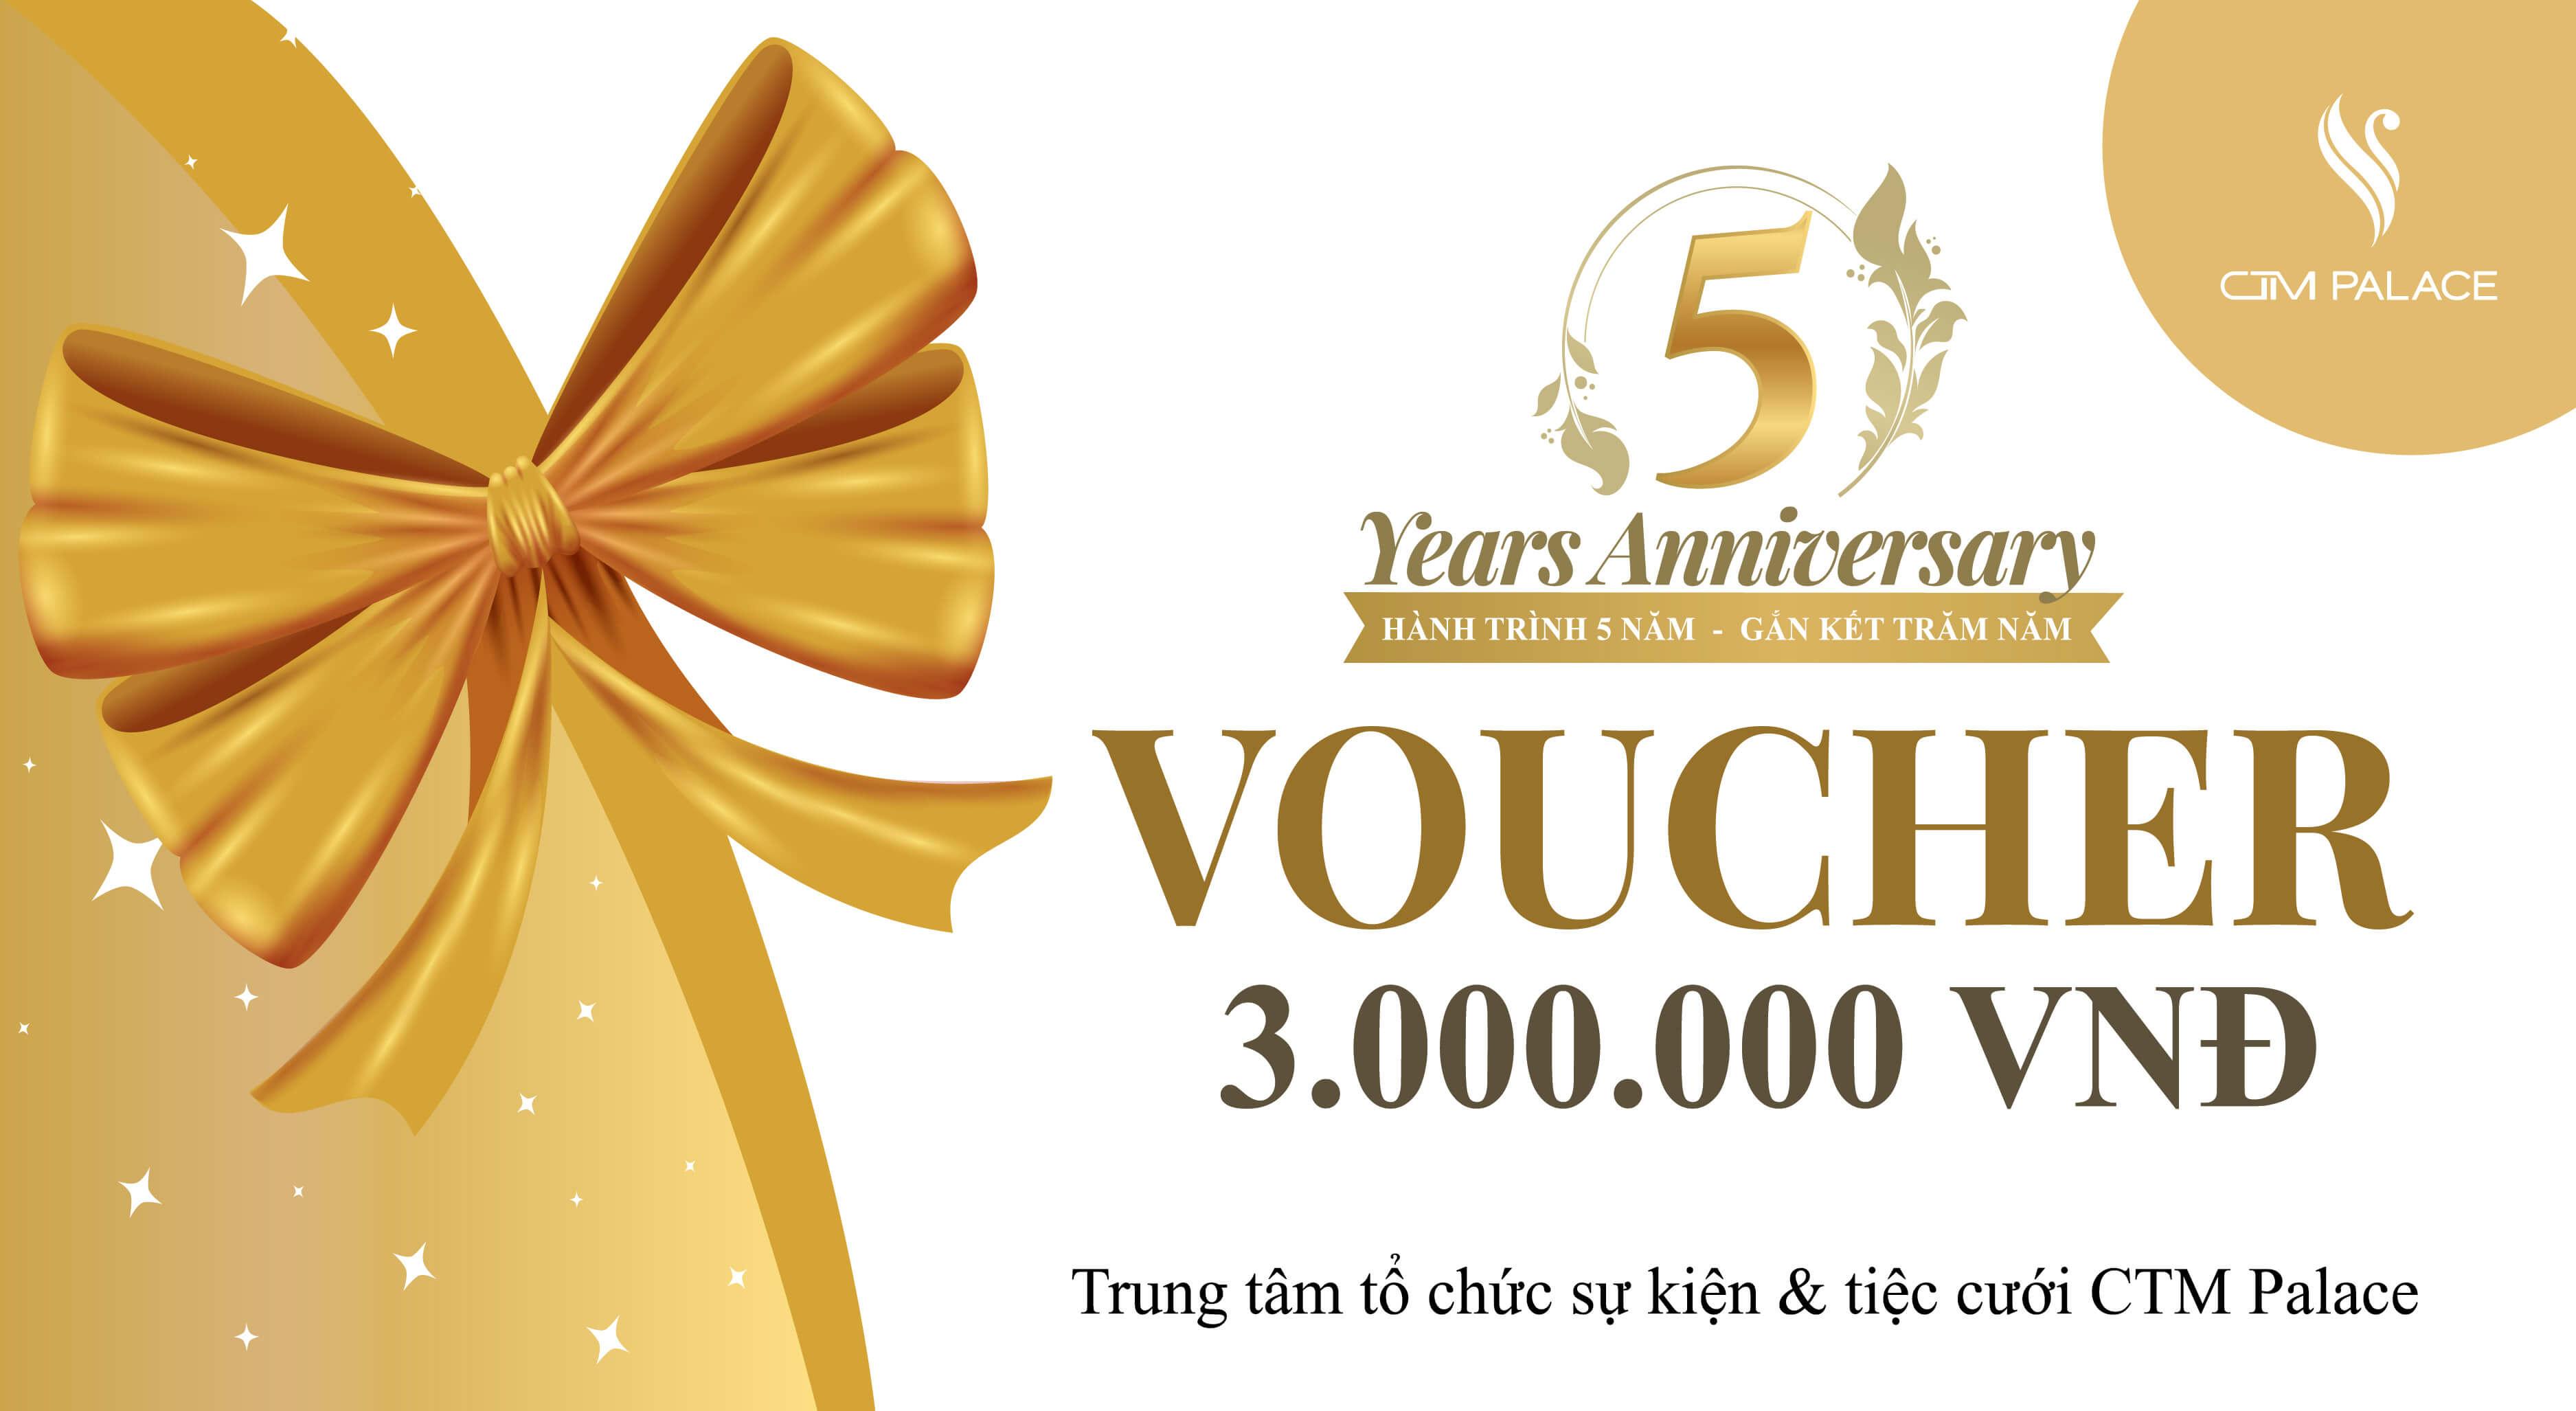 Tặng voucher 3.000.000VNĐ kỷ niệm sinh 5 năm CTM Palace